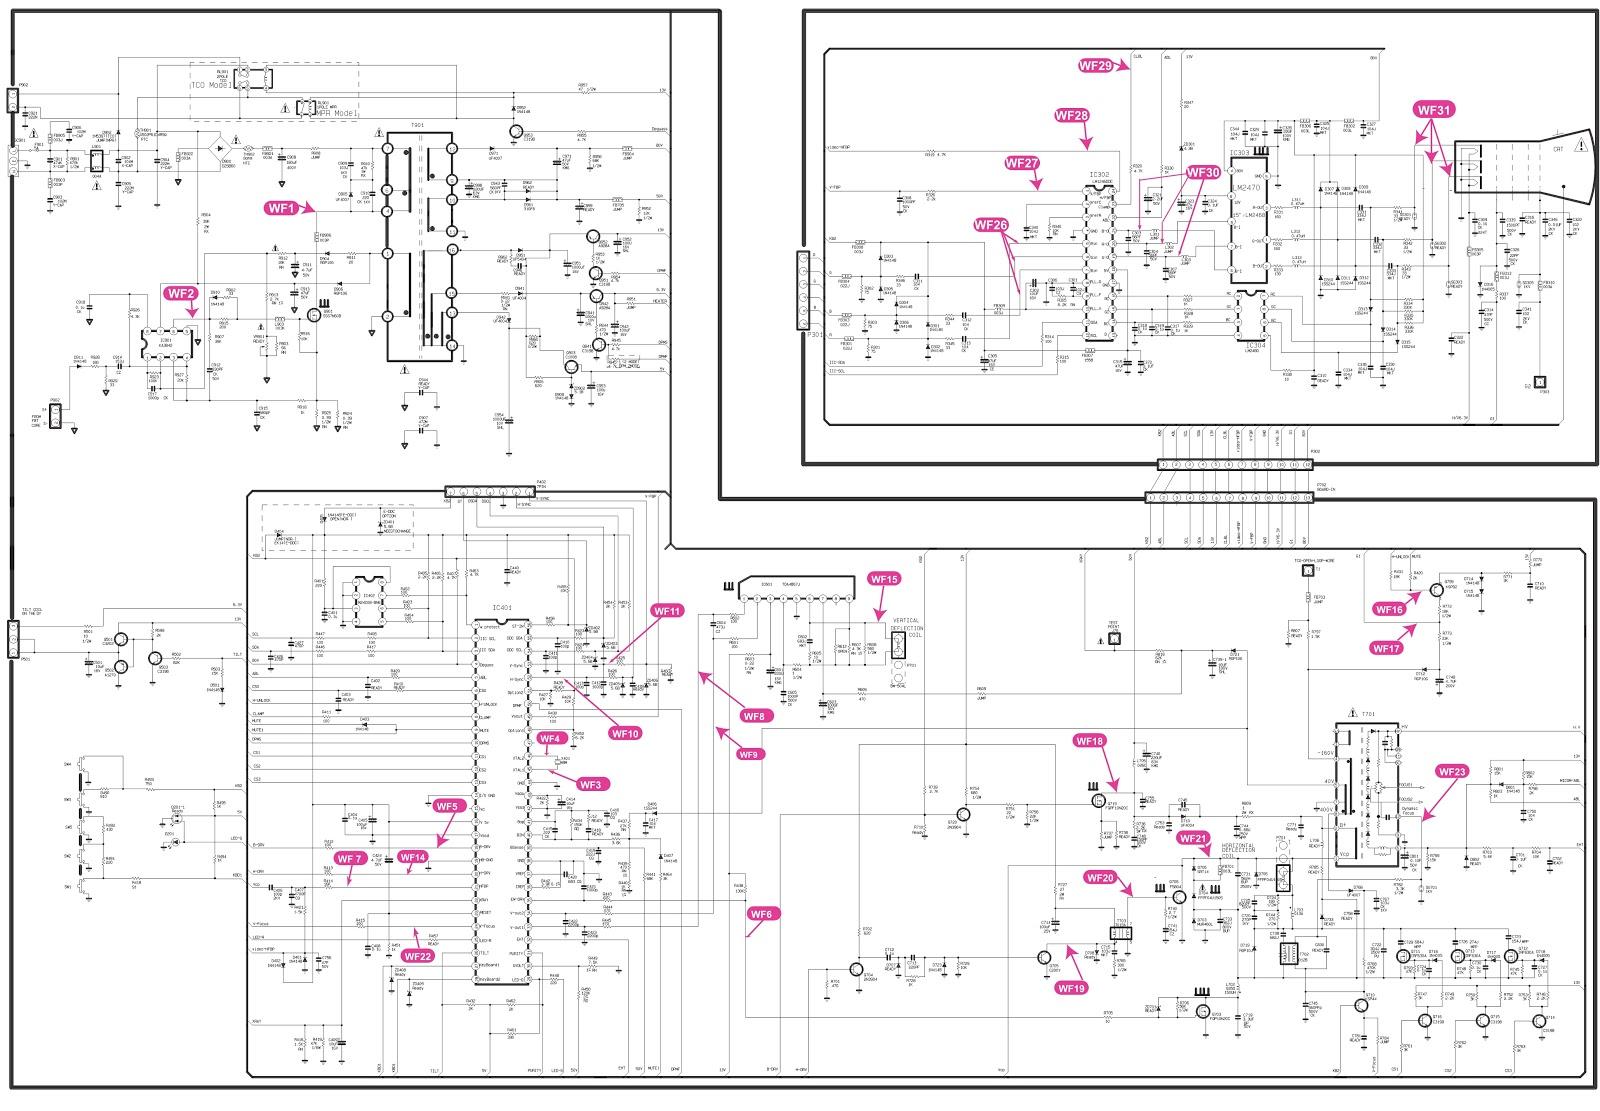 hcl crt monitor circuit diagram